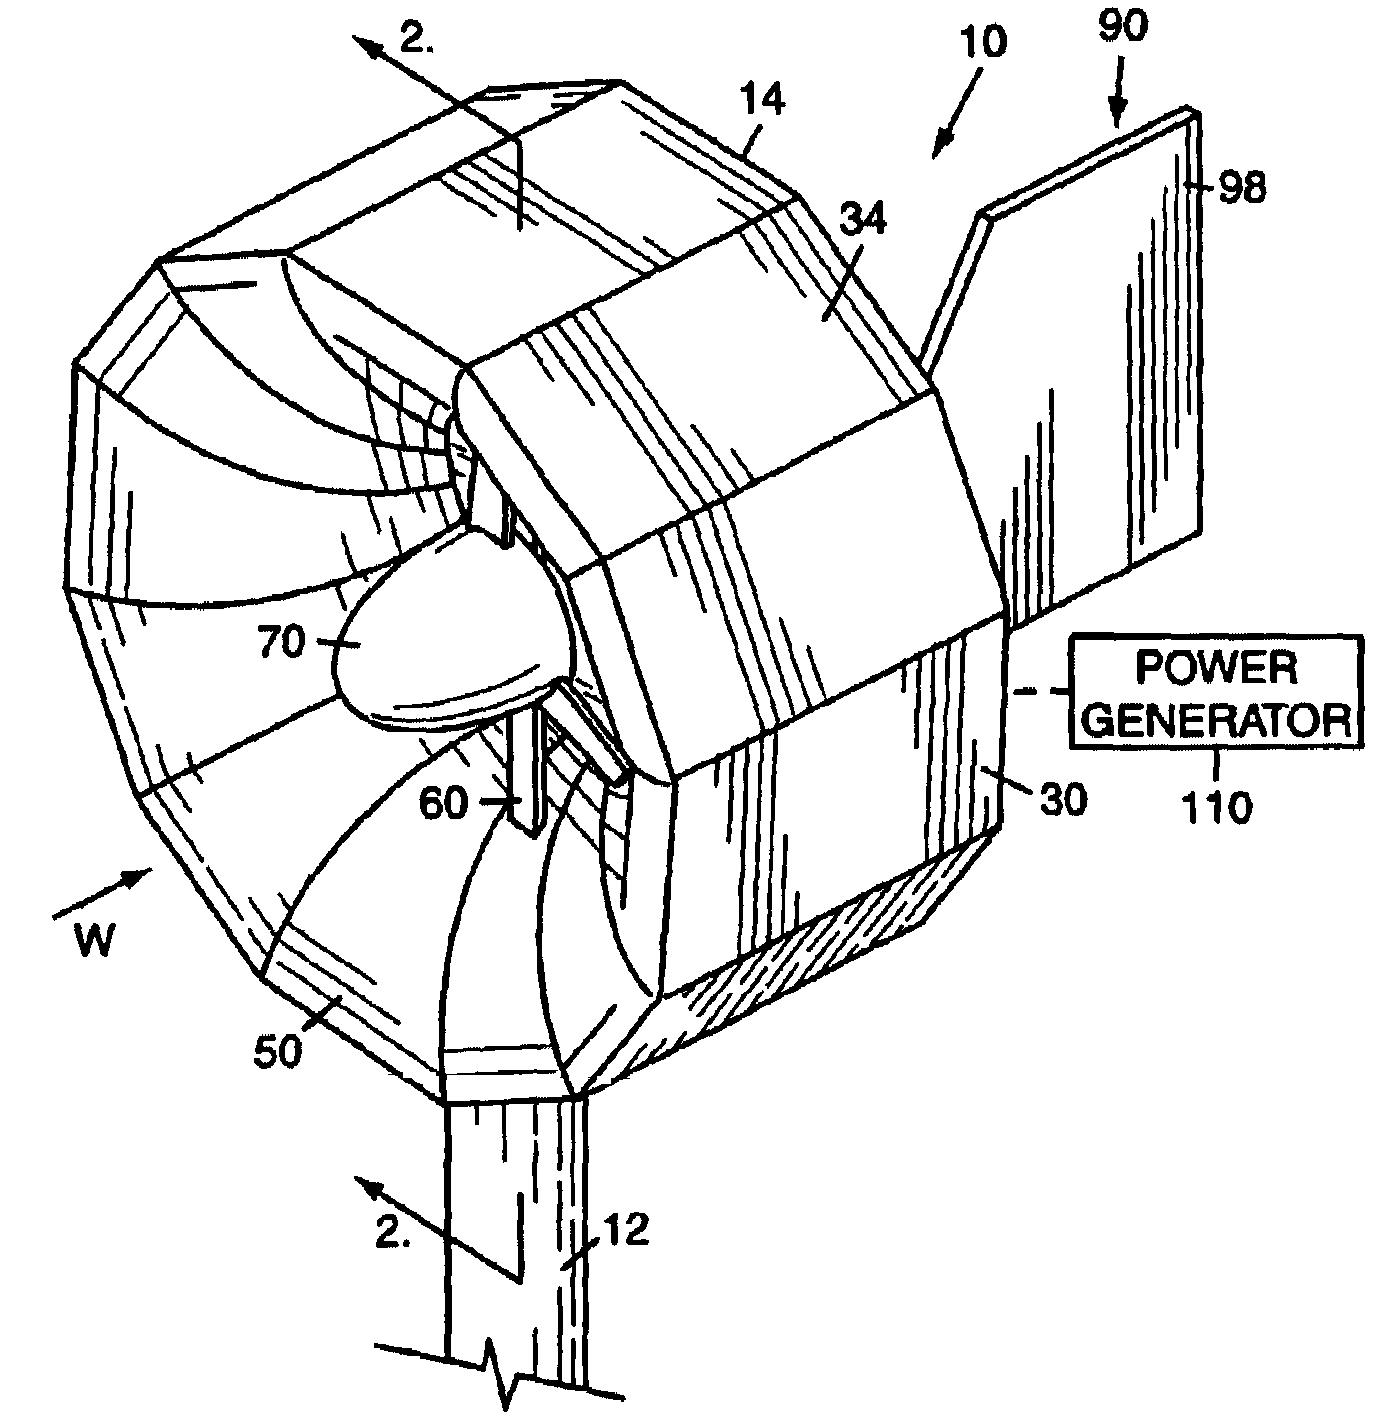 Wind Turbine Wiring